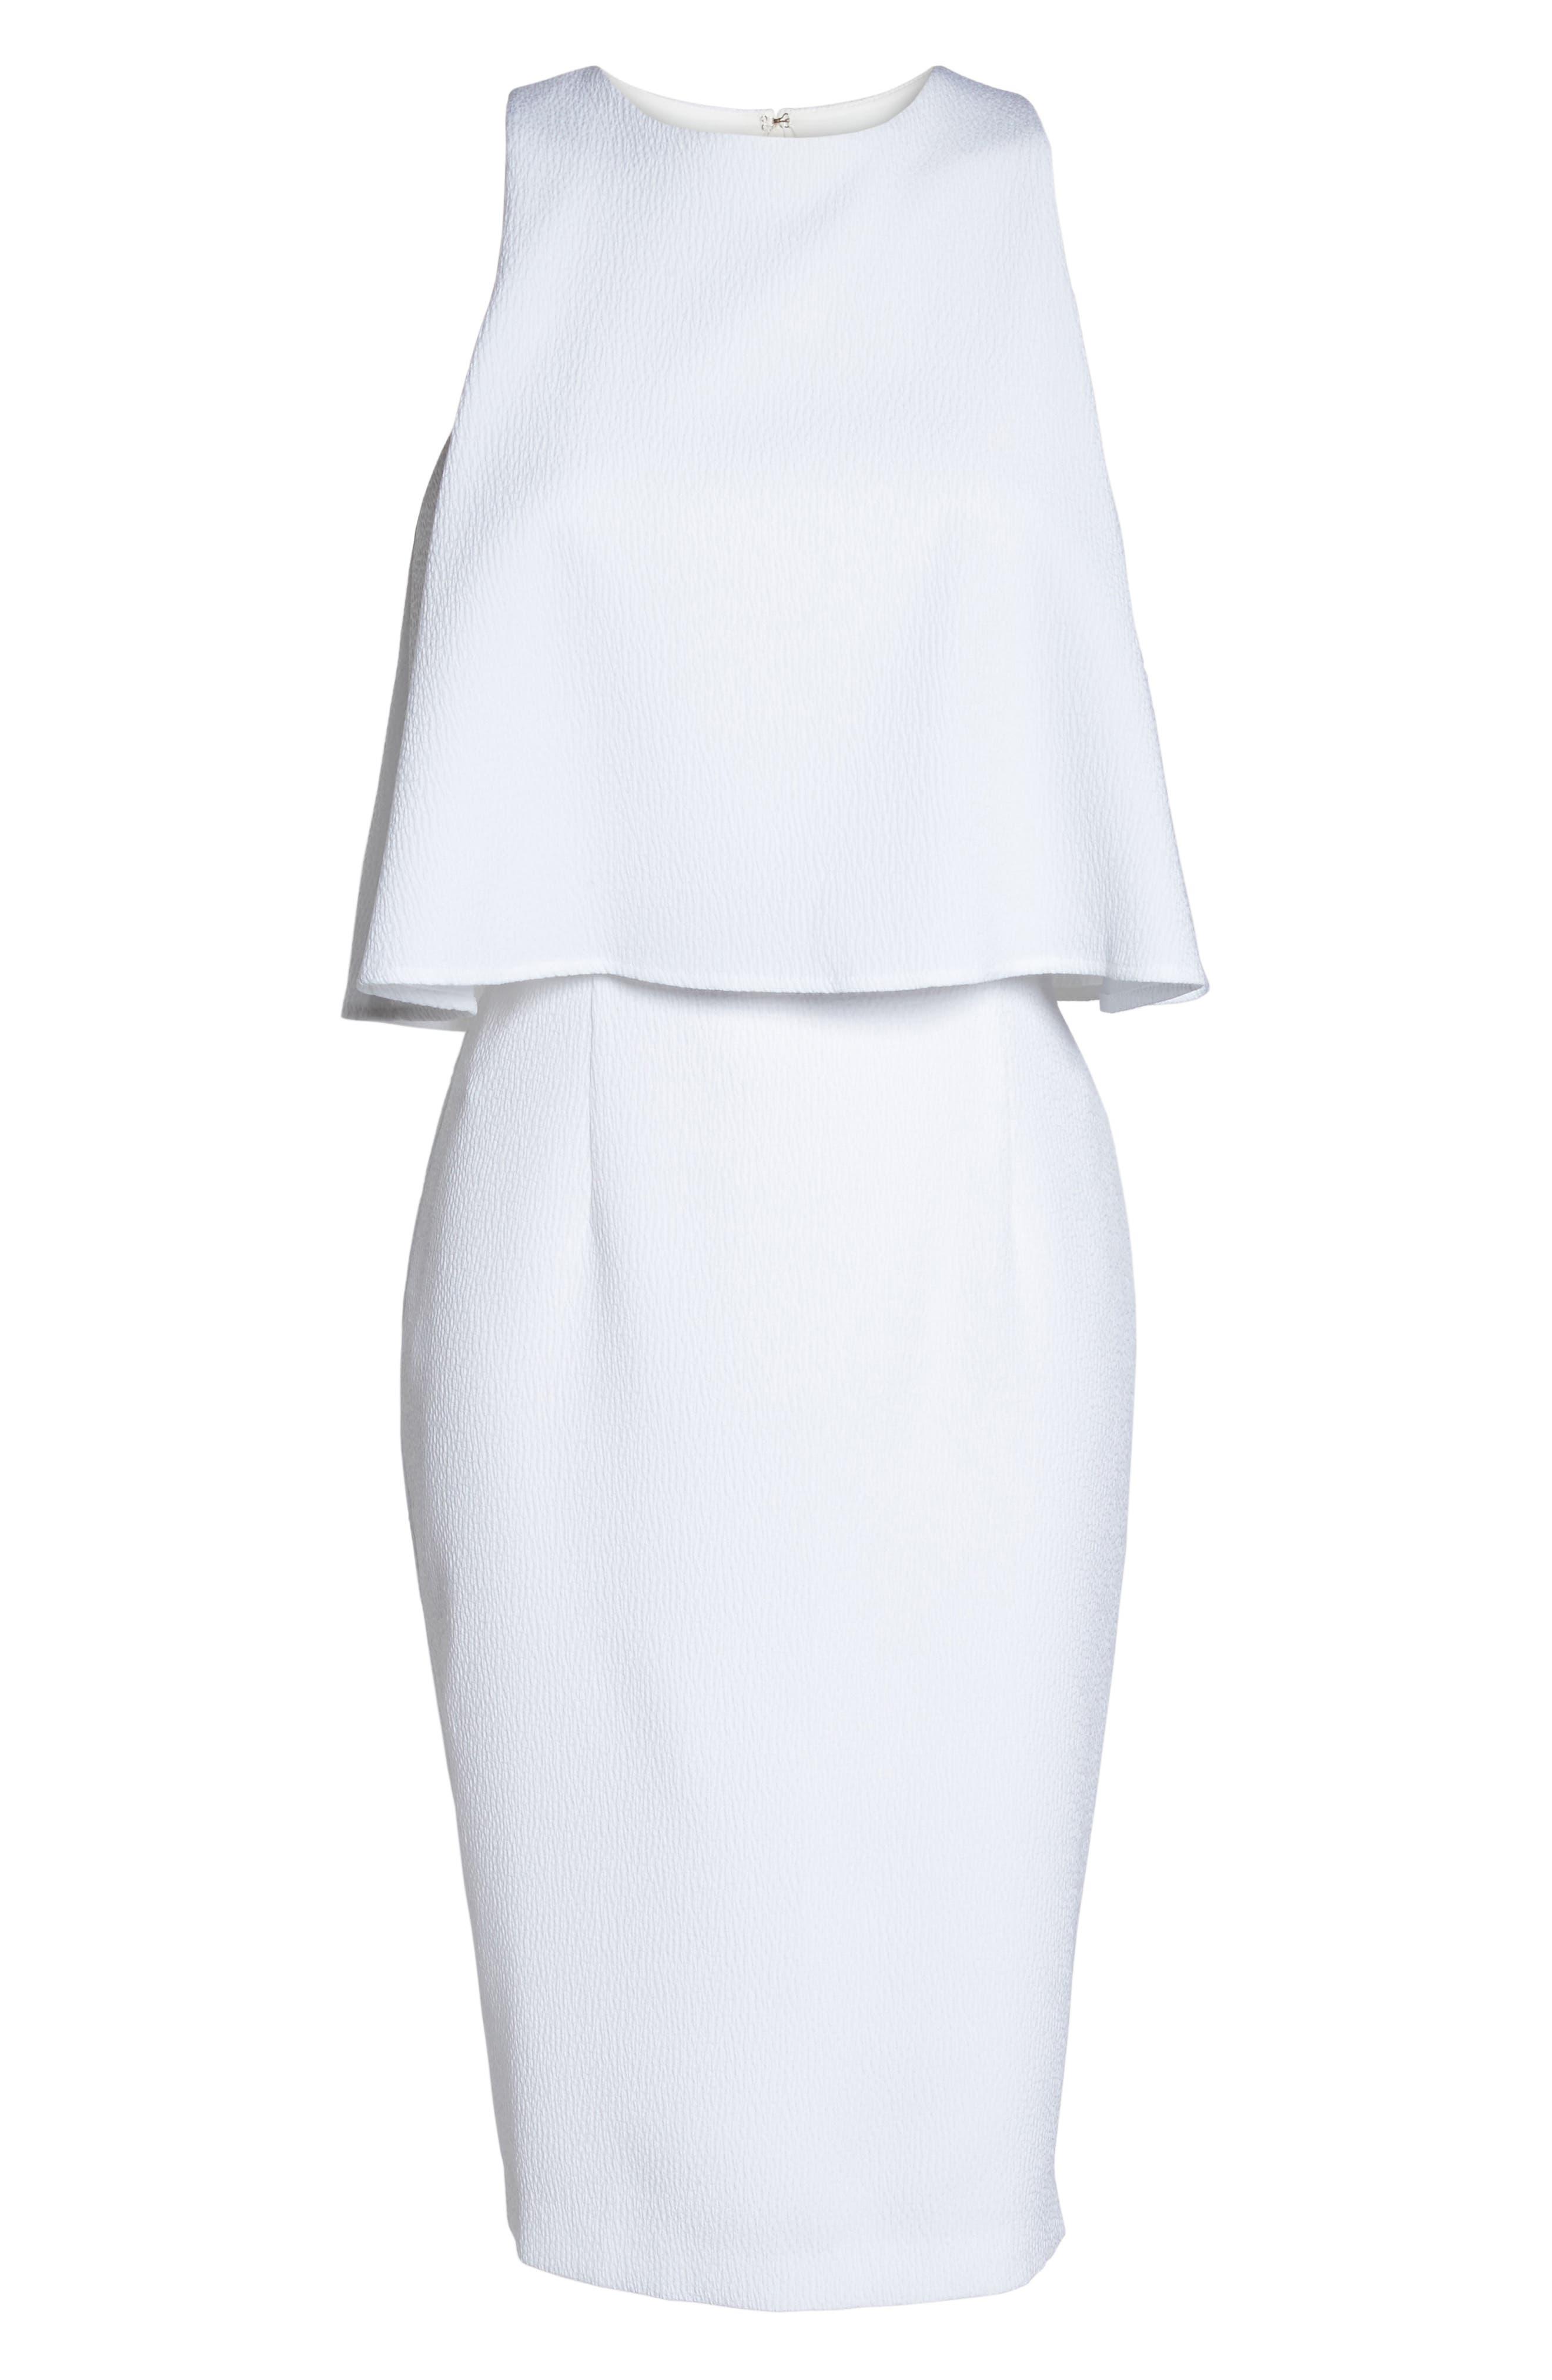 CHELSEA28, Popover Crop Sheath Dress, Alternate thumbnail 7, color, WHITE SNOW